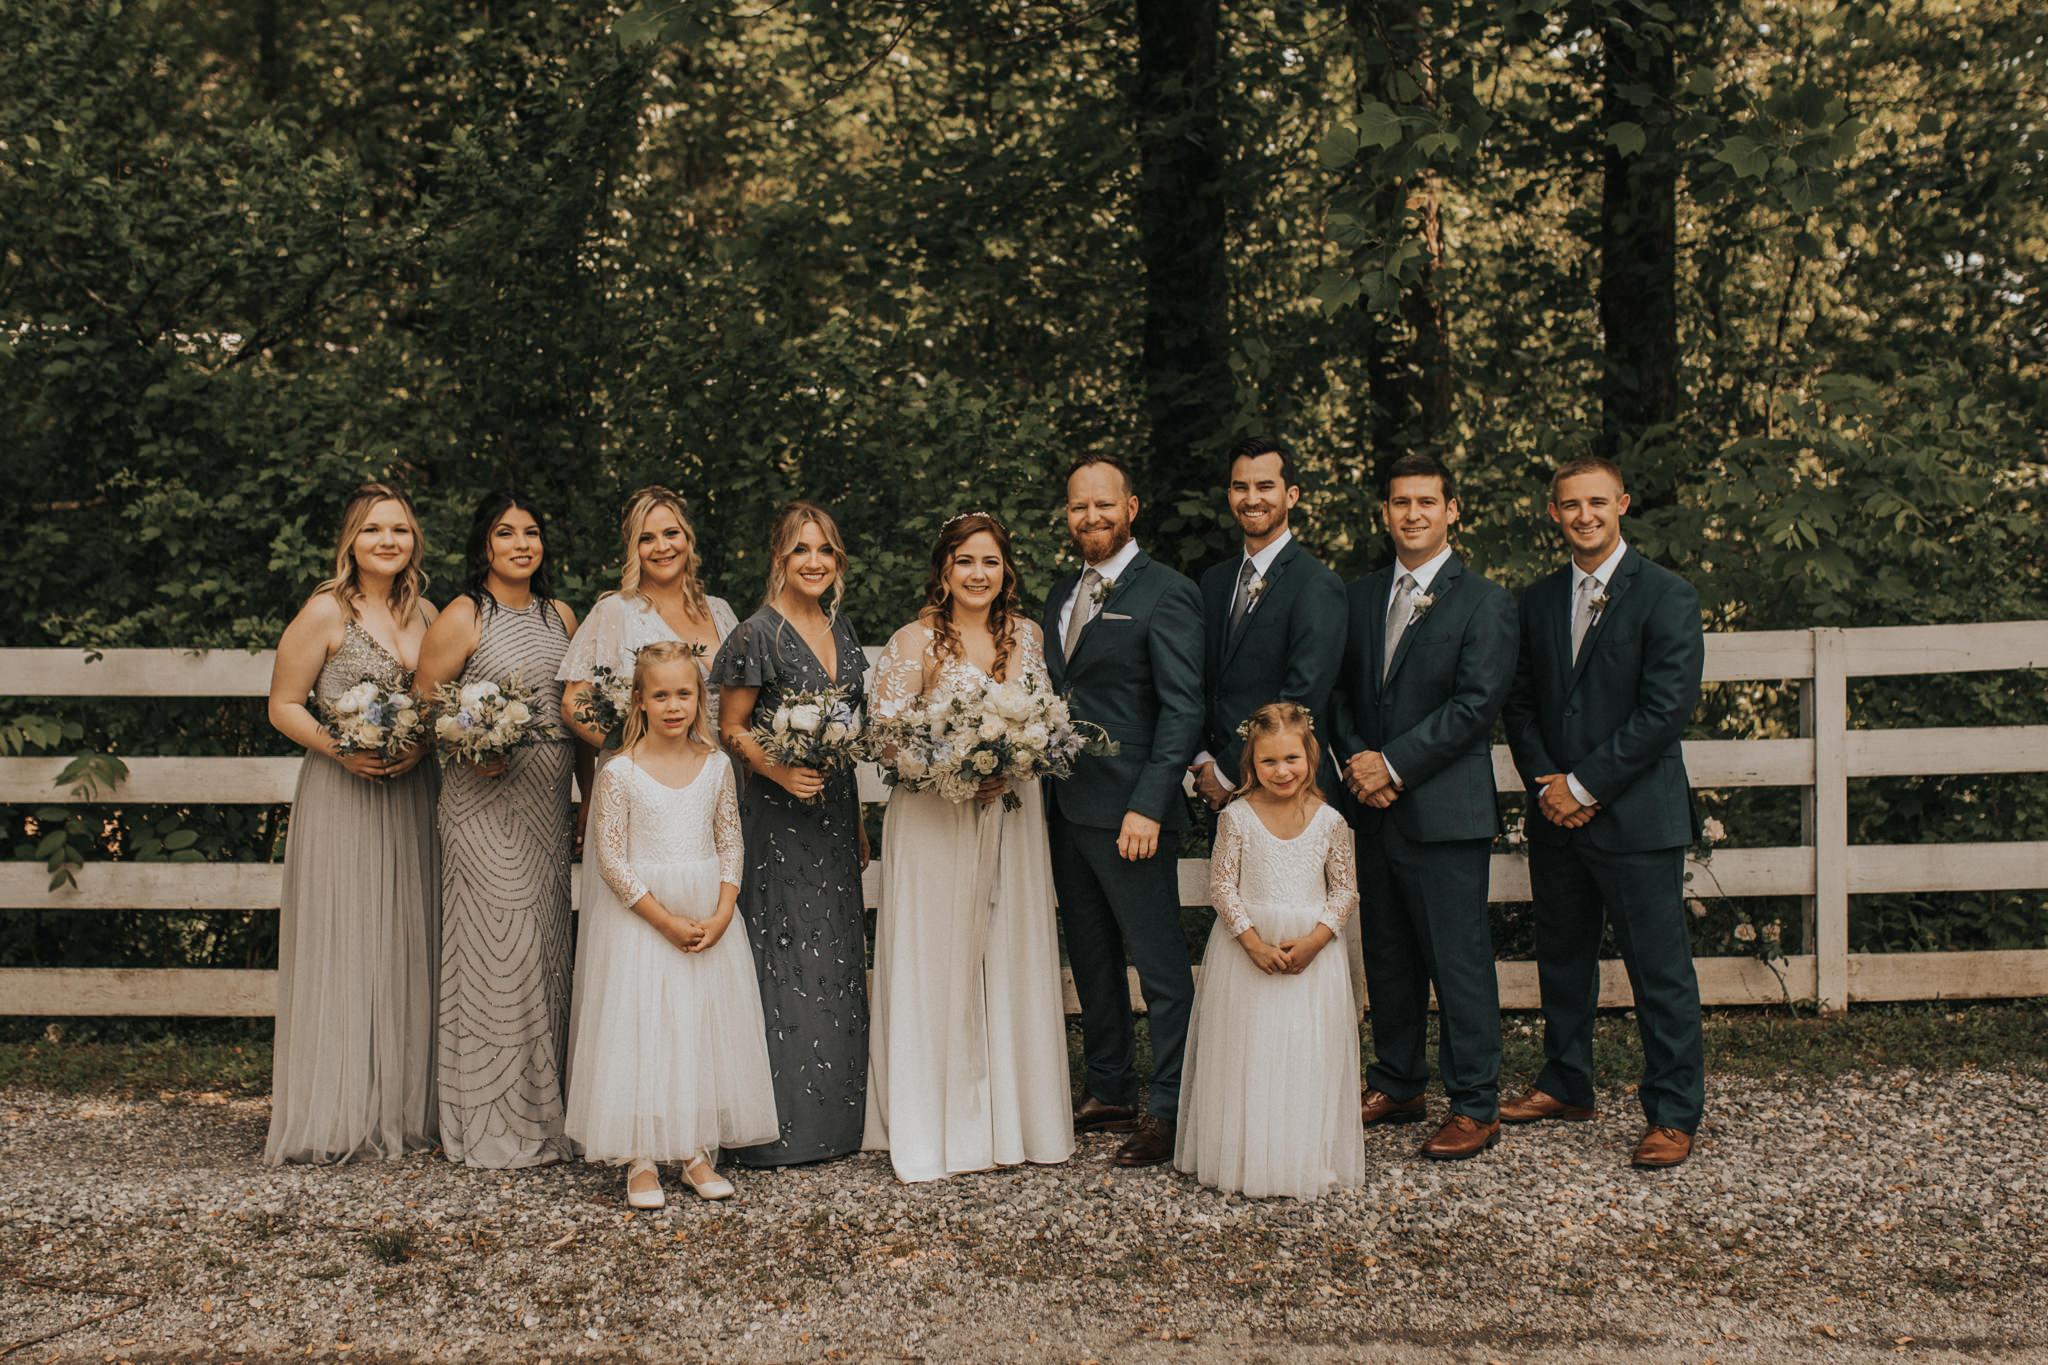 KateMatt-North-Georgia-Wedding-Photographer-Mountain-Laurel-Farm-51.jpg